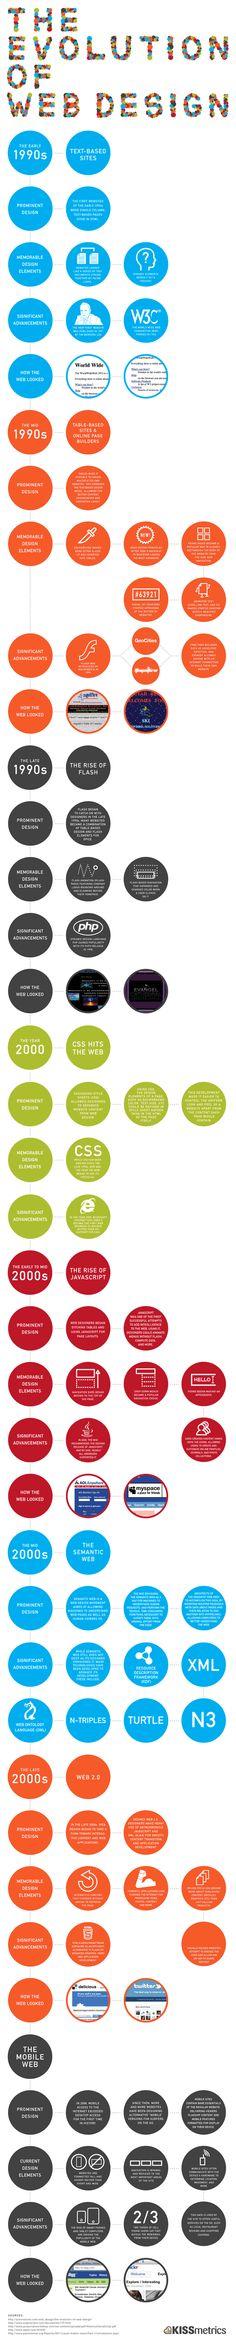 evolution-of-web-design-infographic.png (580×5755)